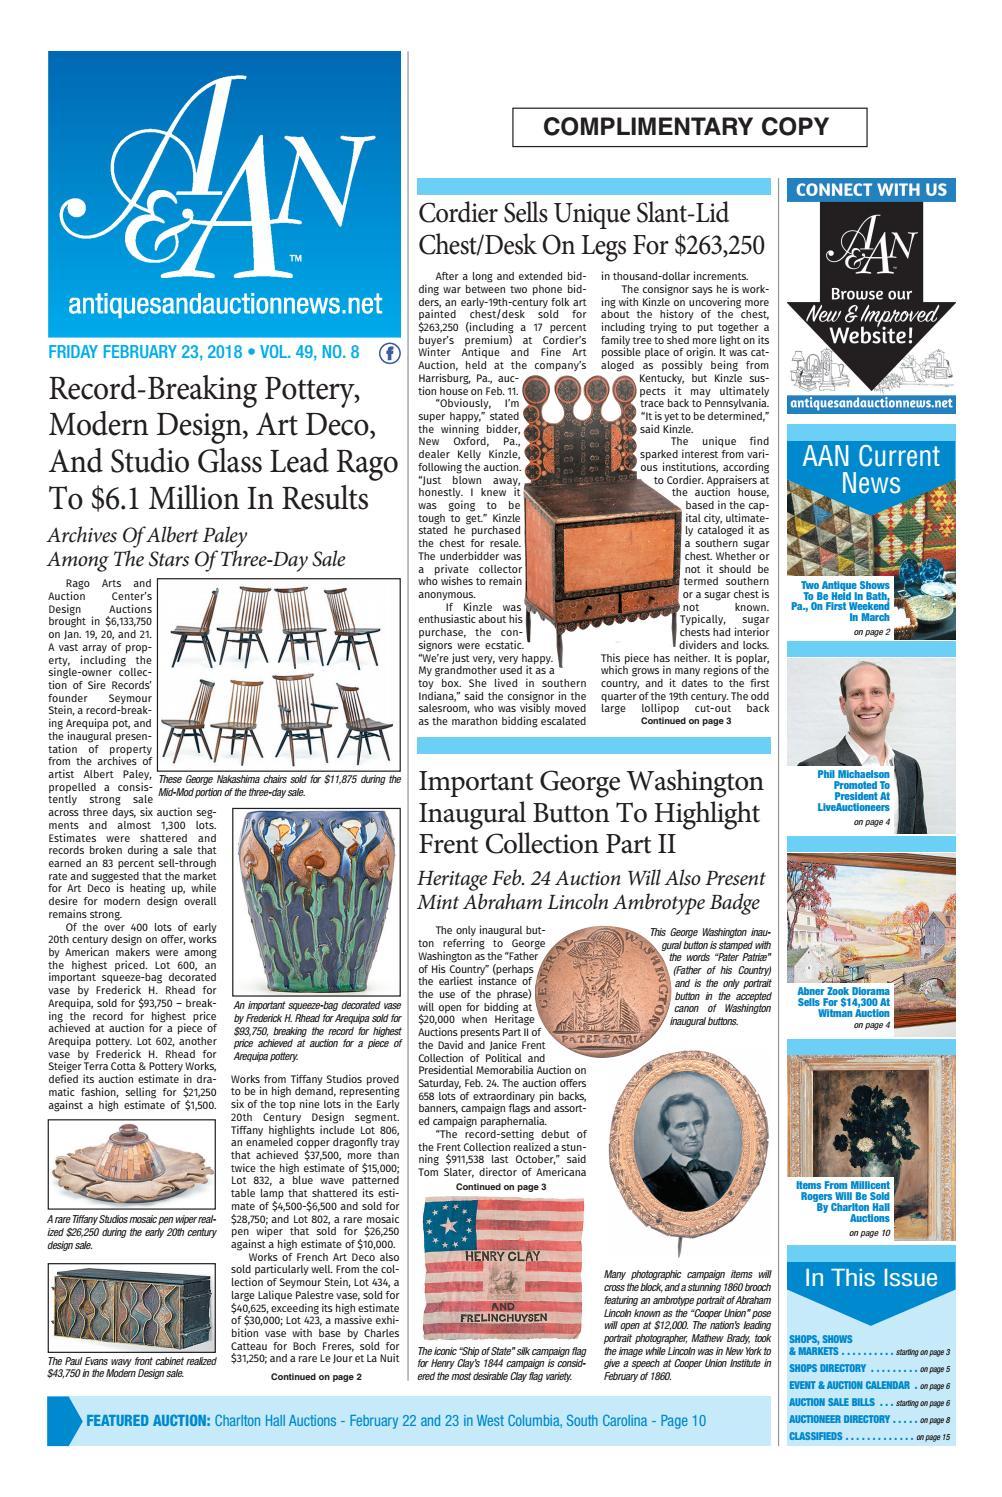 Antiques & Auction News 022318 by Antiques & Auction News